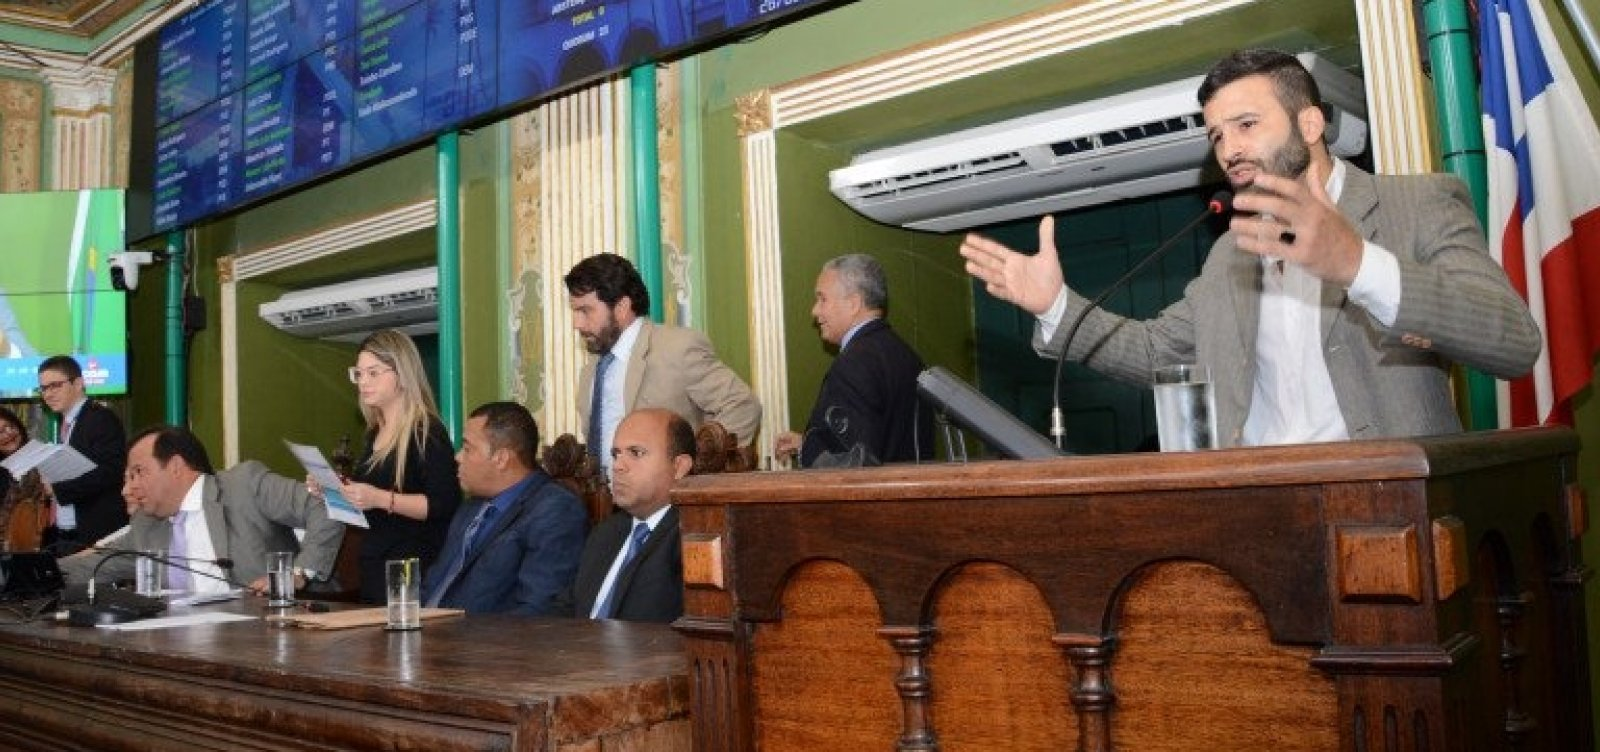 Representante dos motoristas de aplicativos pode disputar vaga na Câmara de Salvador